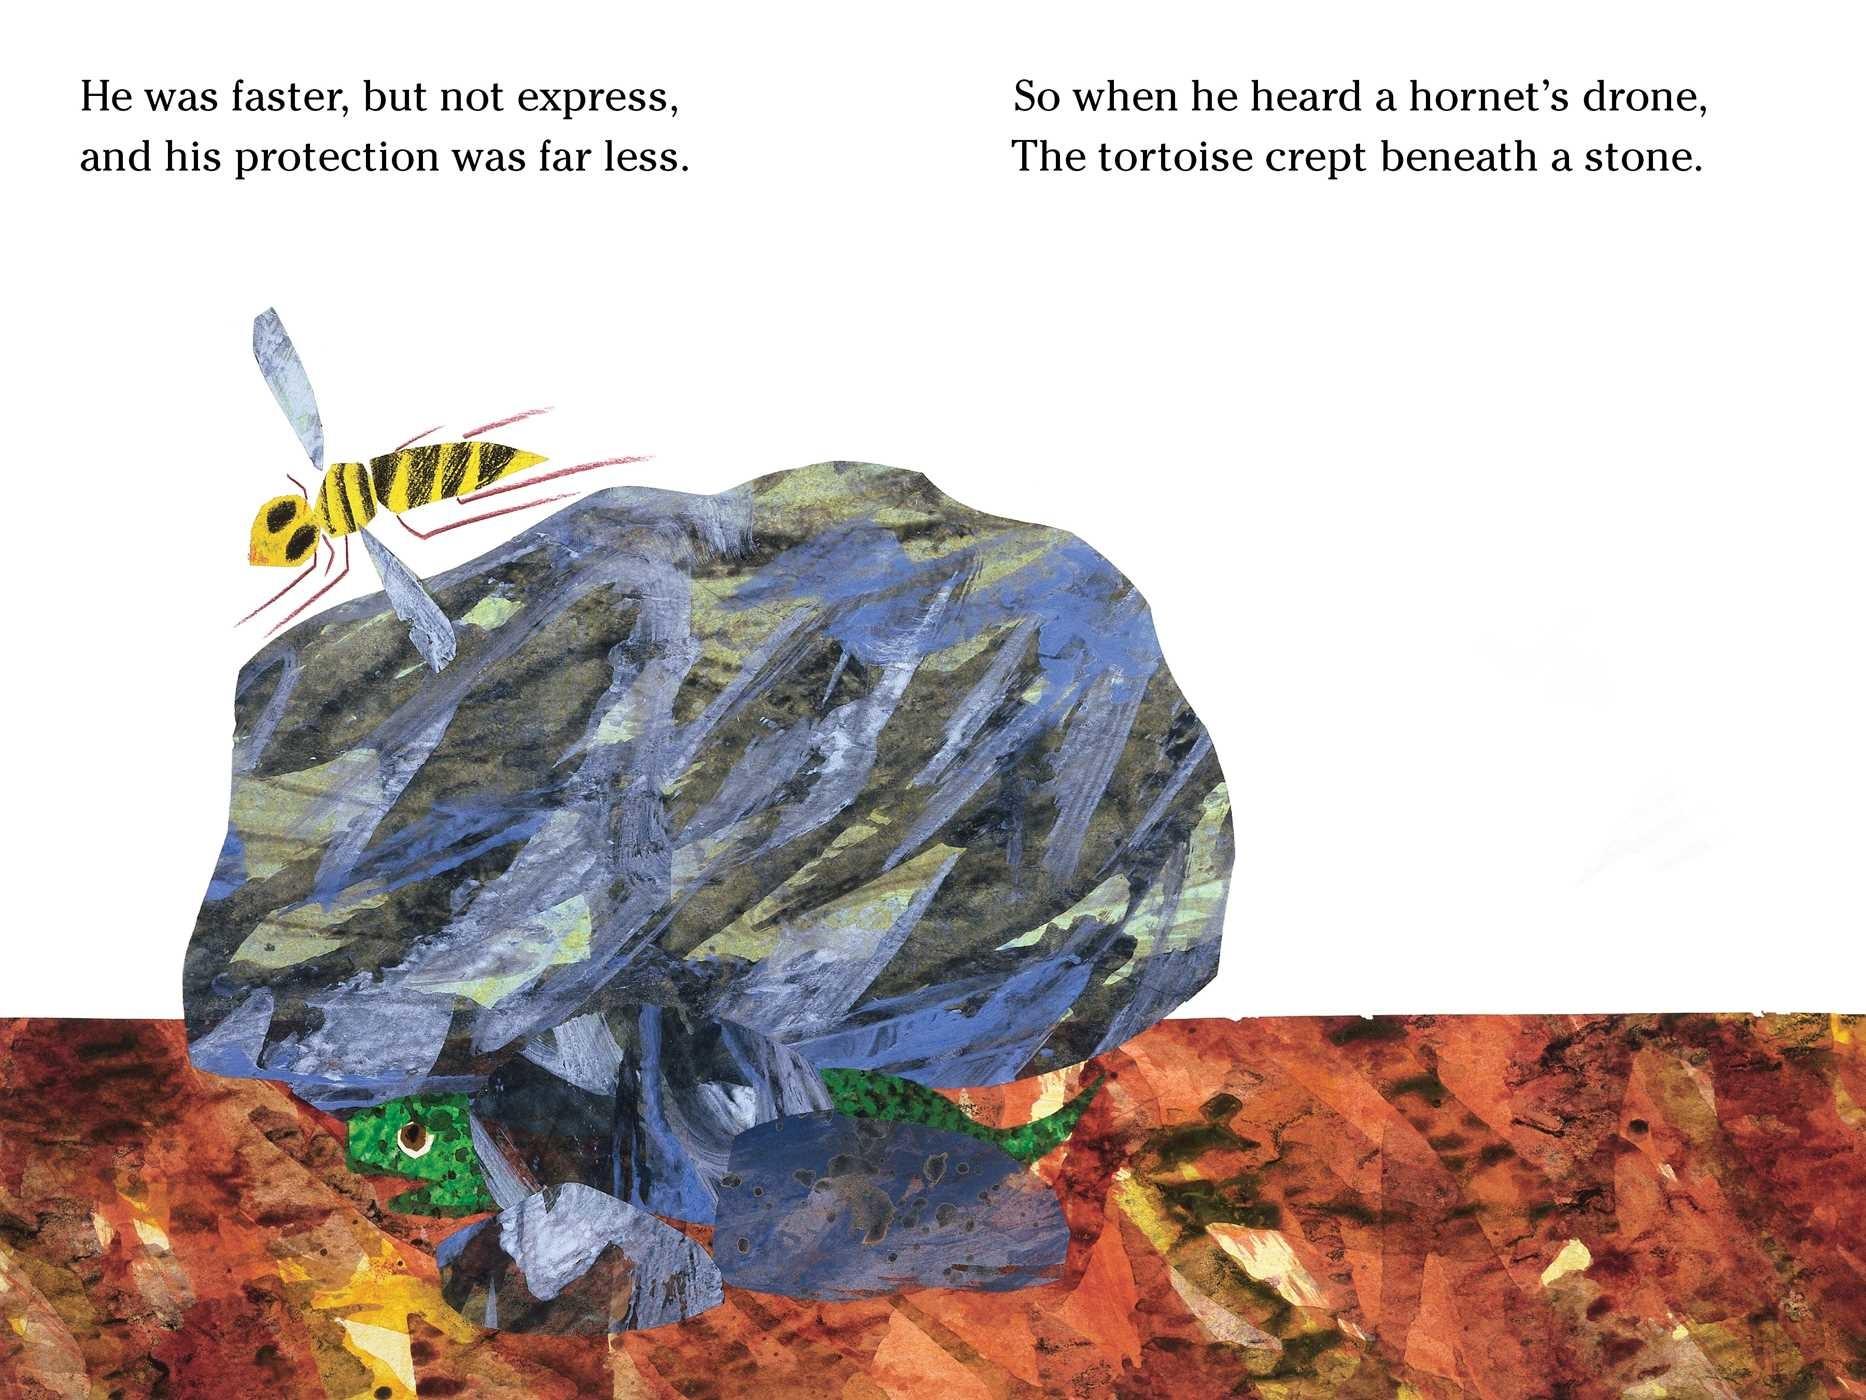 The foolish tortoise 9781481435772.in01